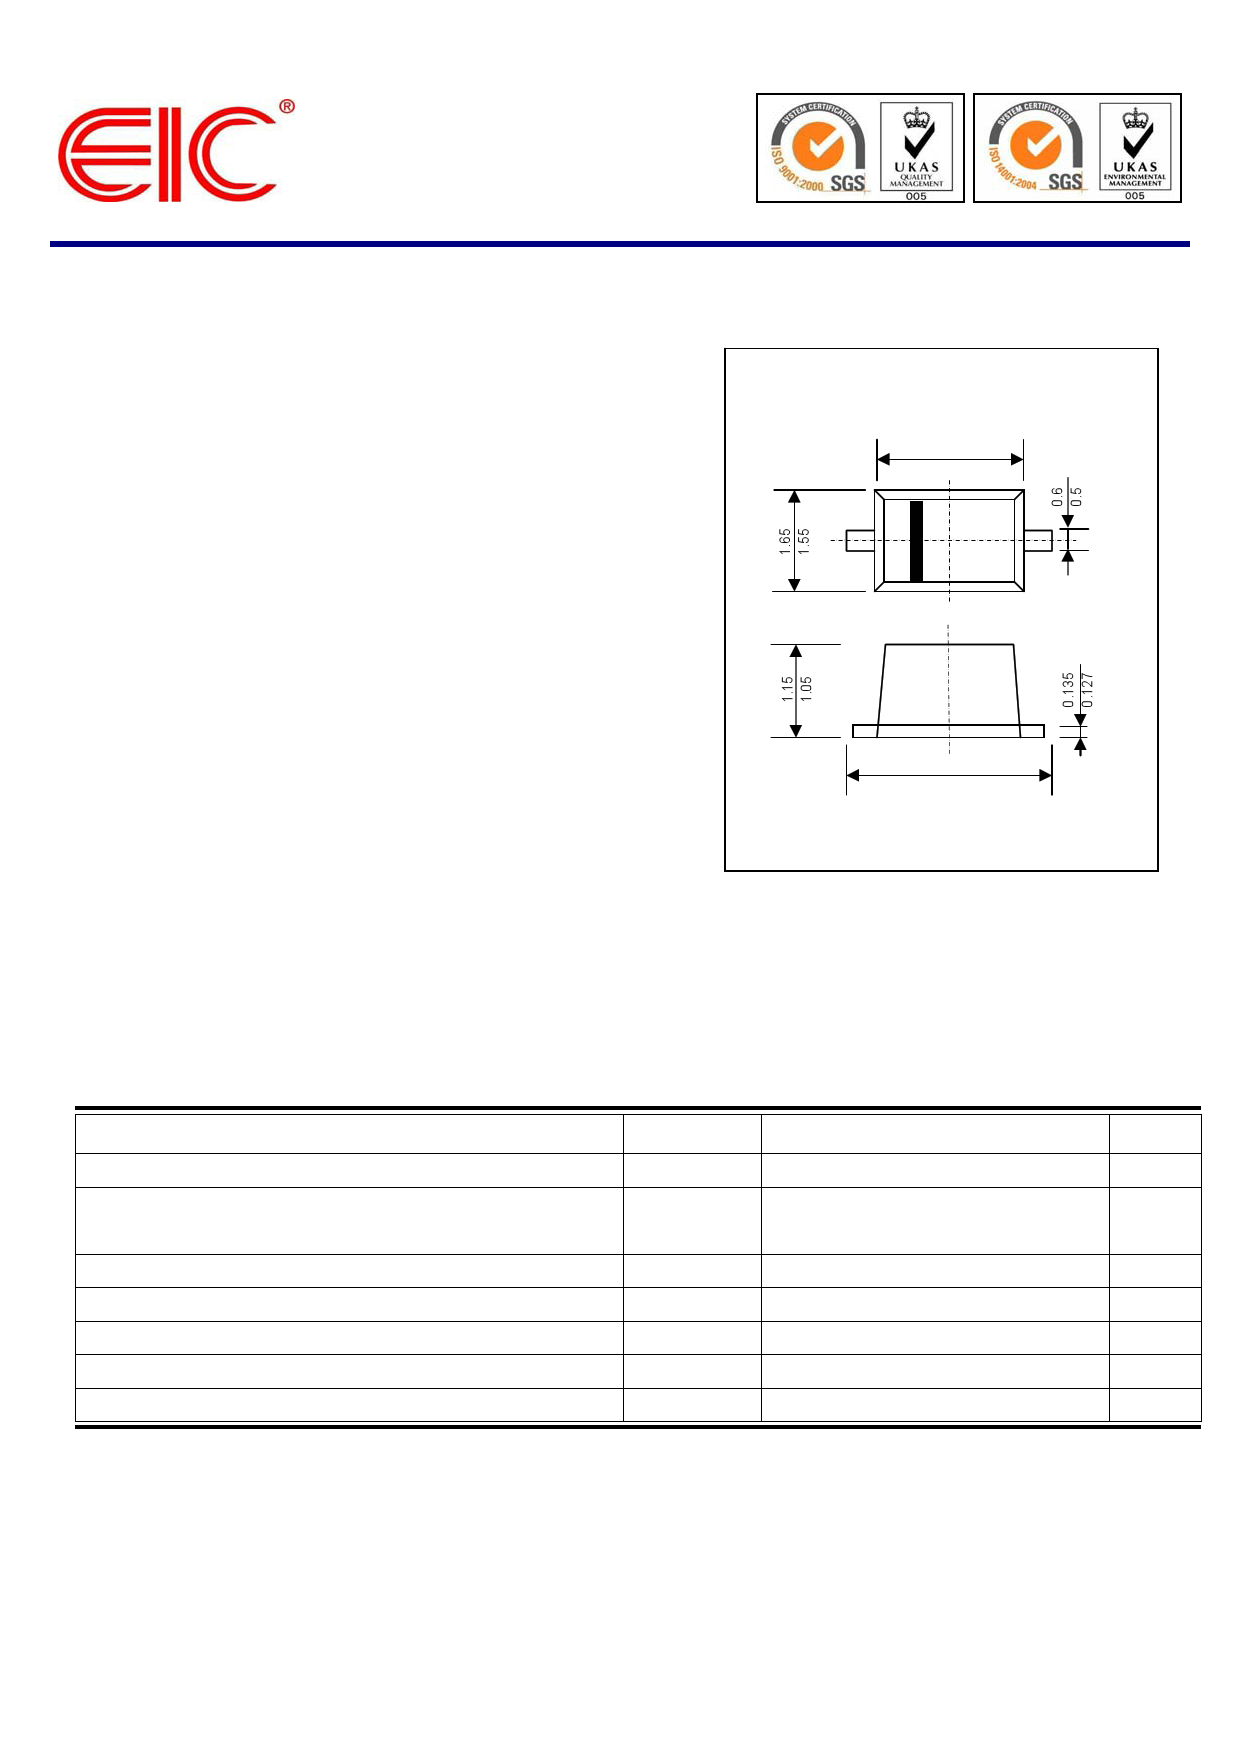 MMSZ5264B Datasheet